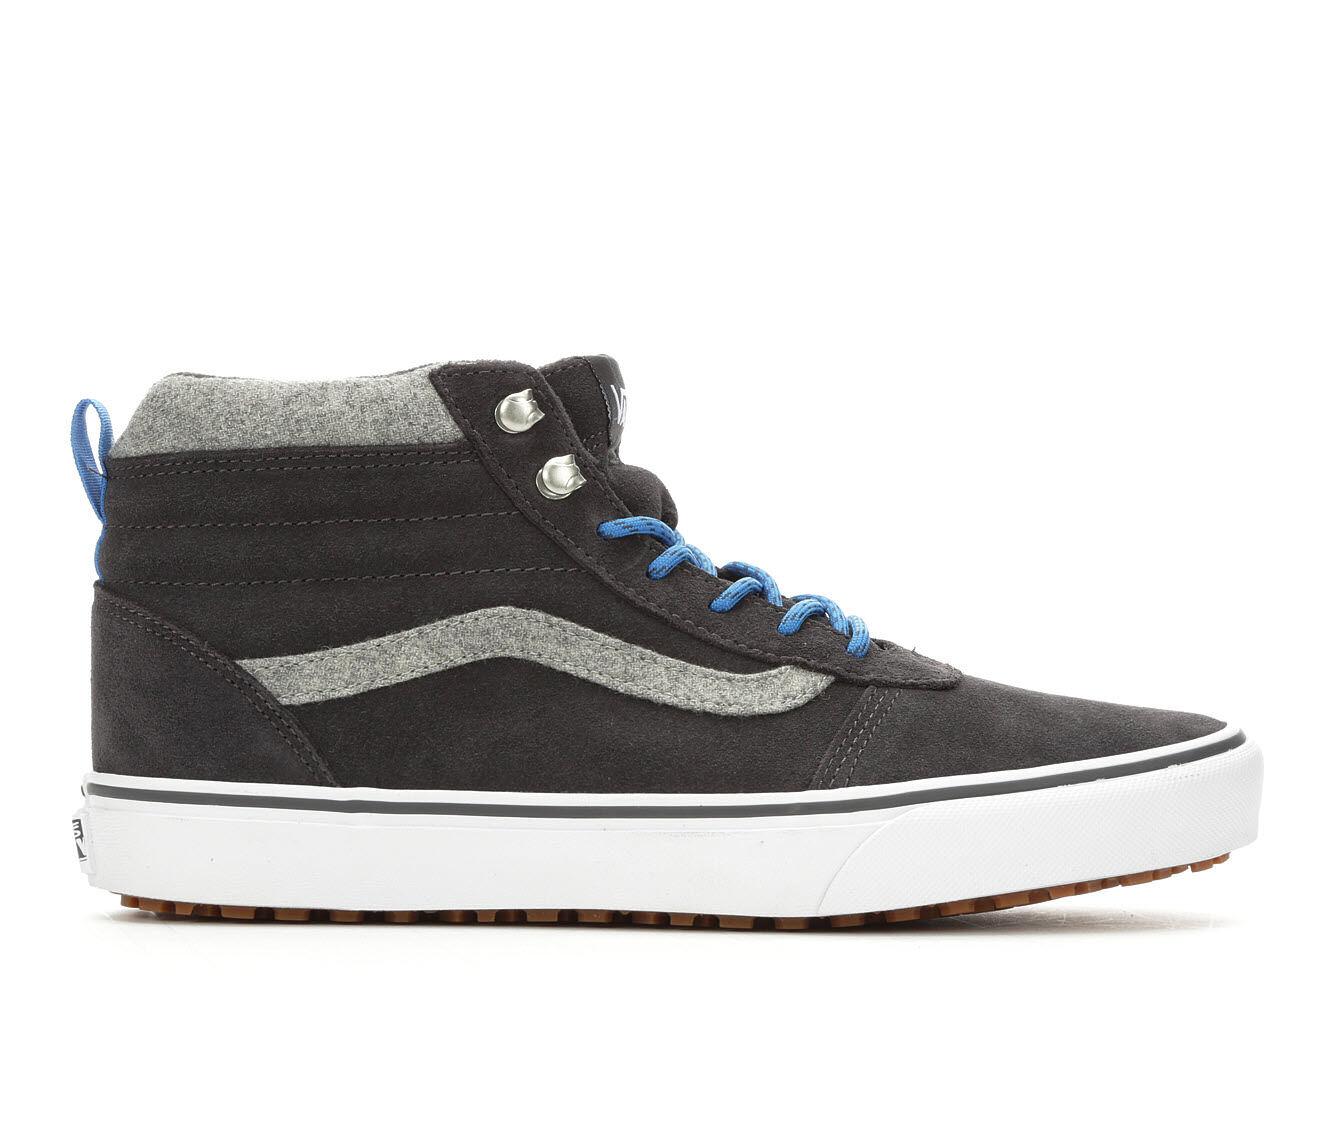 Men's Vans Ward Hi MTE Skate Shoes Grey/White/Blue